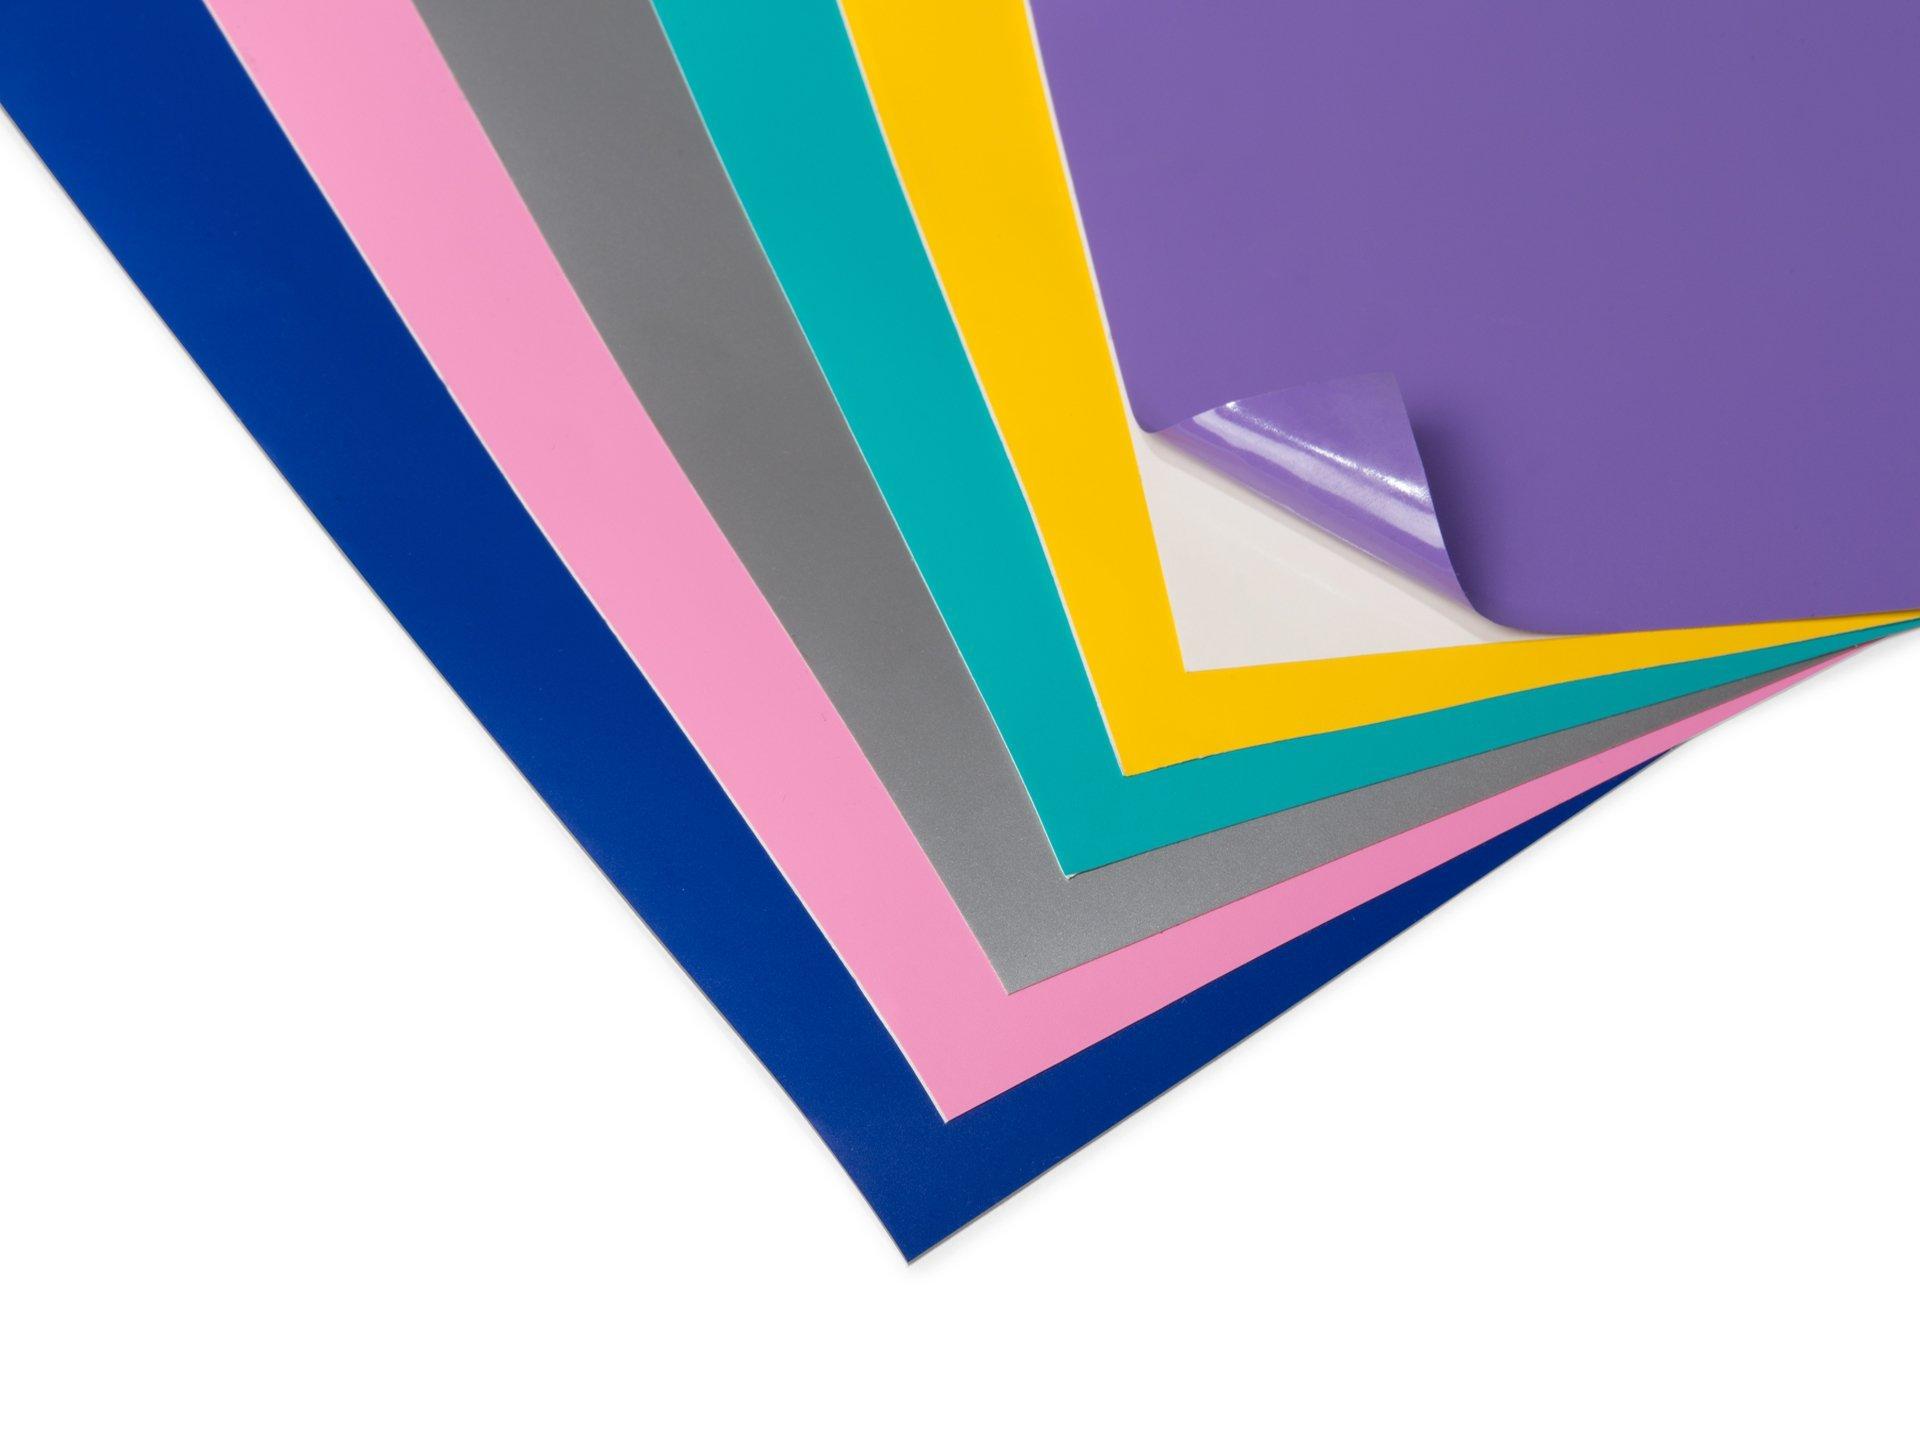 Oracal 631 farbklebefolie opak matt kaufen modulor for Farbige klebefolien